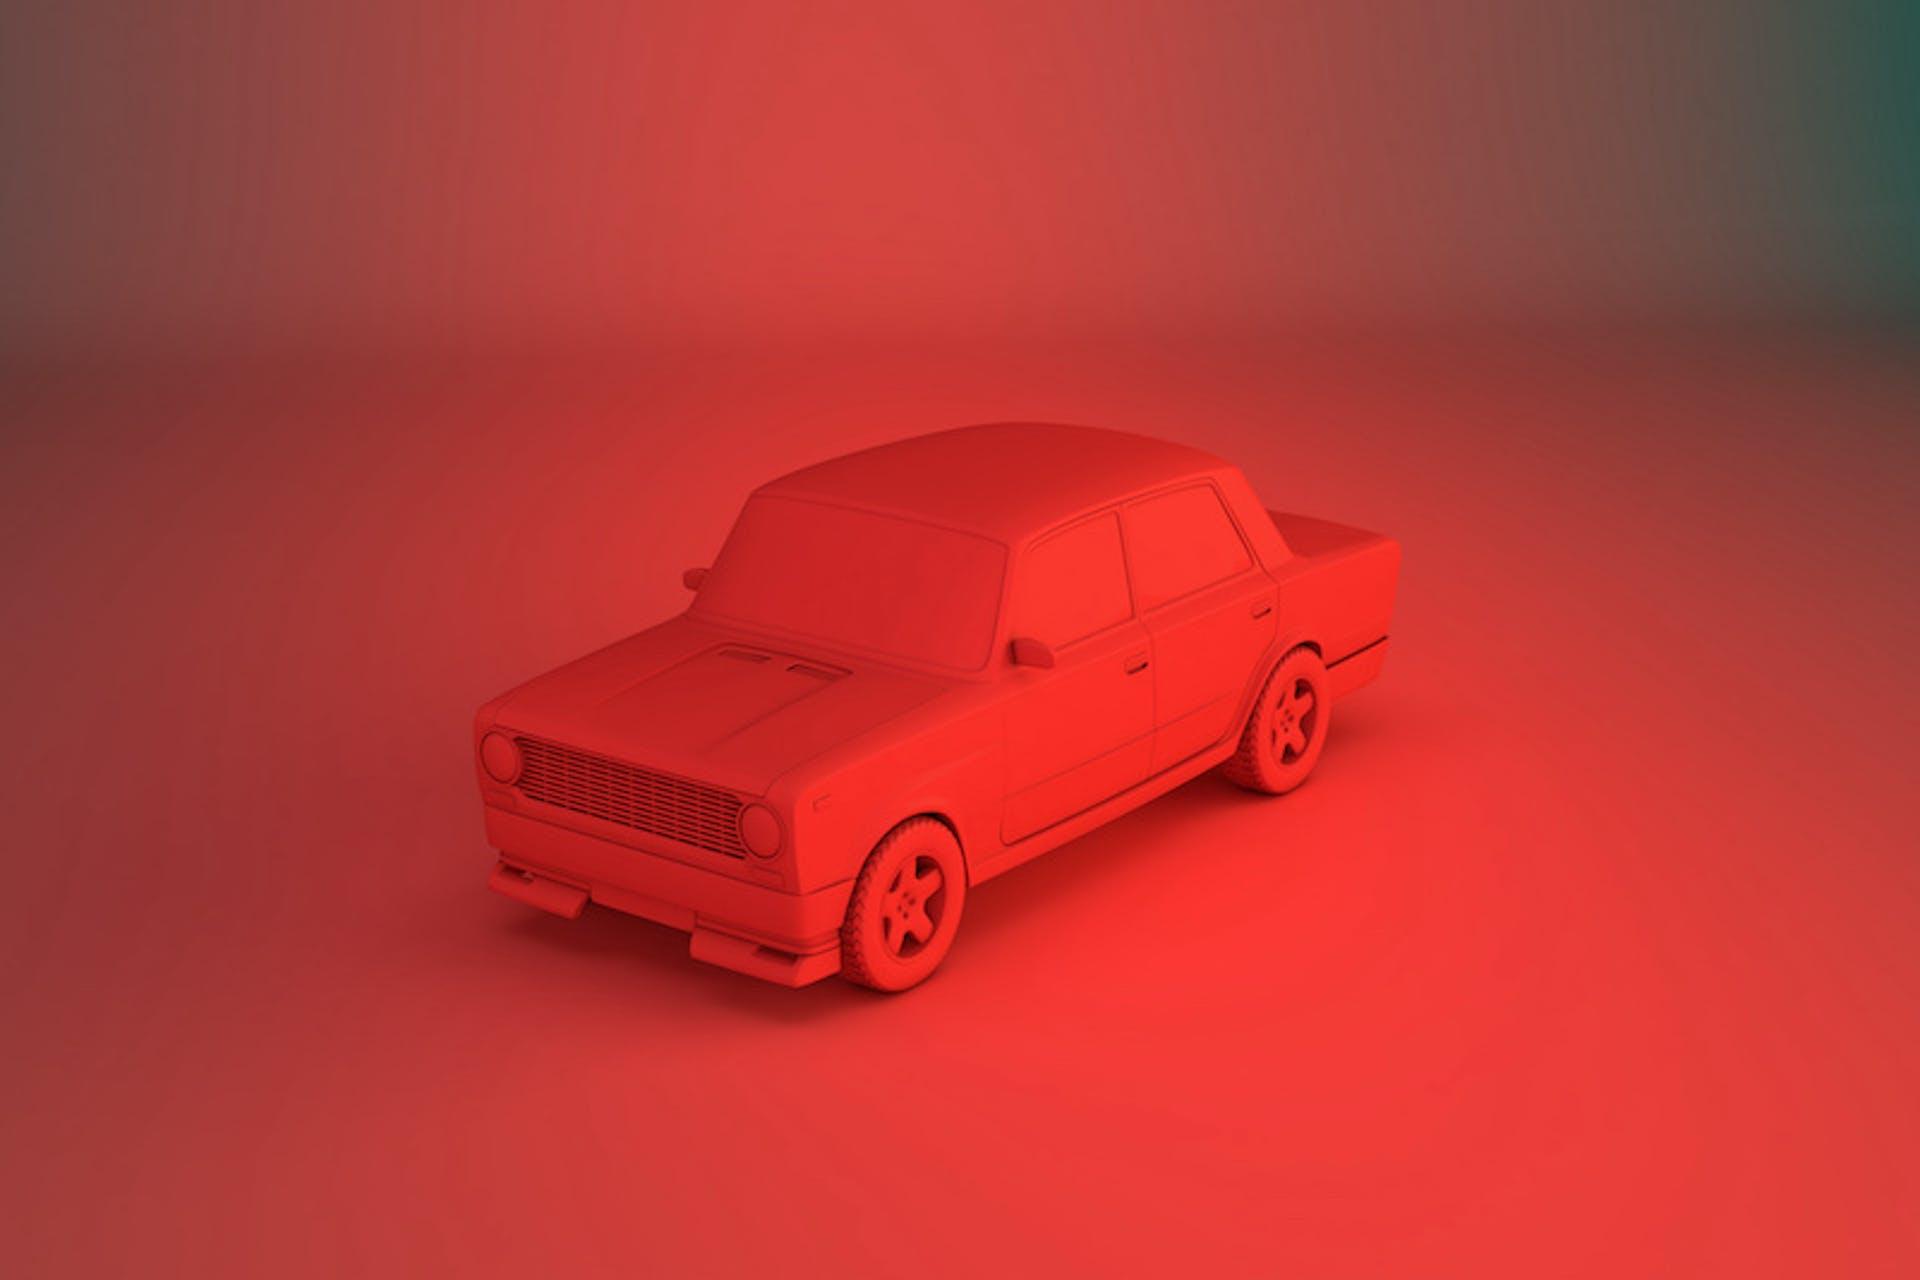 Rotes Auto vor rotem Hintergrund